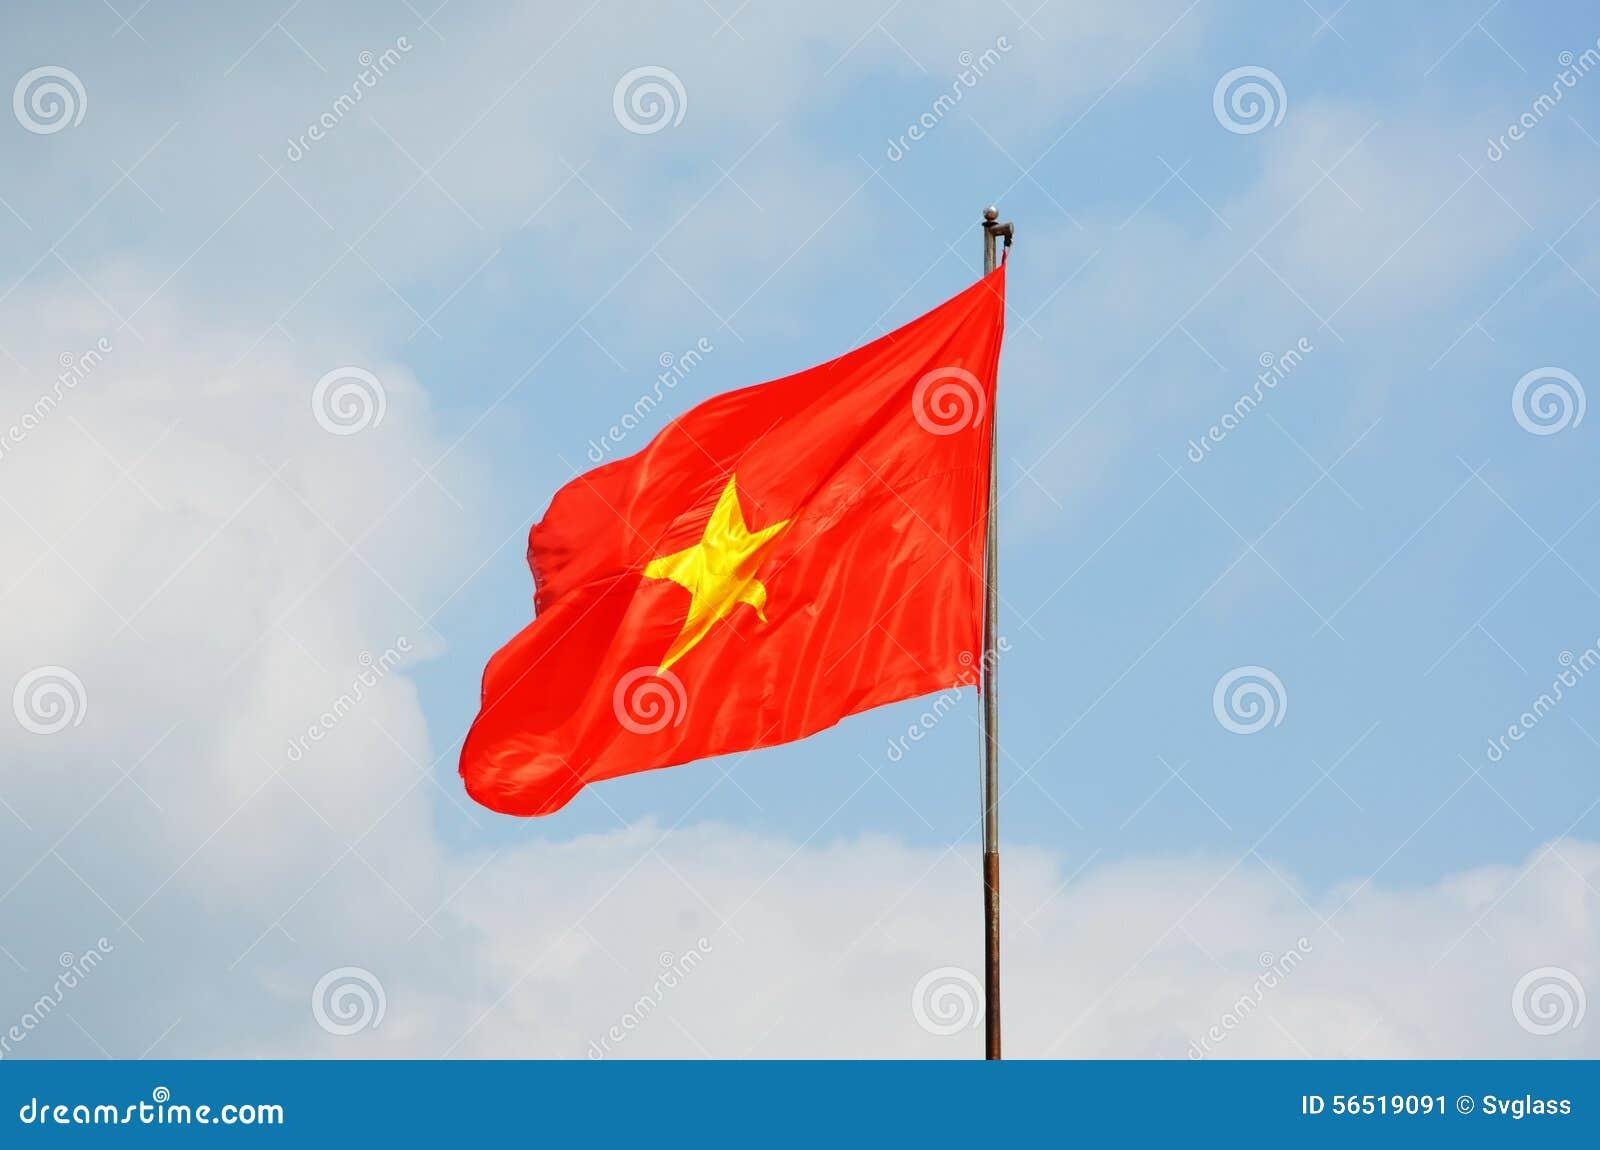 socialist republic of vietnam essay Cong hoa xa hoi chu nghia viet nam (socialist republic of vietnam) form of government socialist republic with one legislative house (national assembly [500].